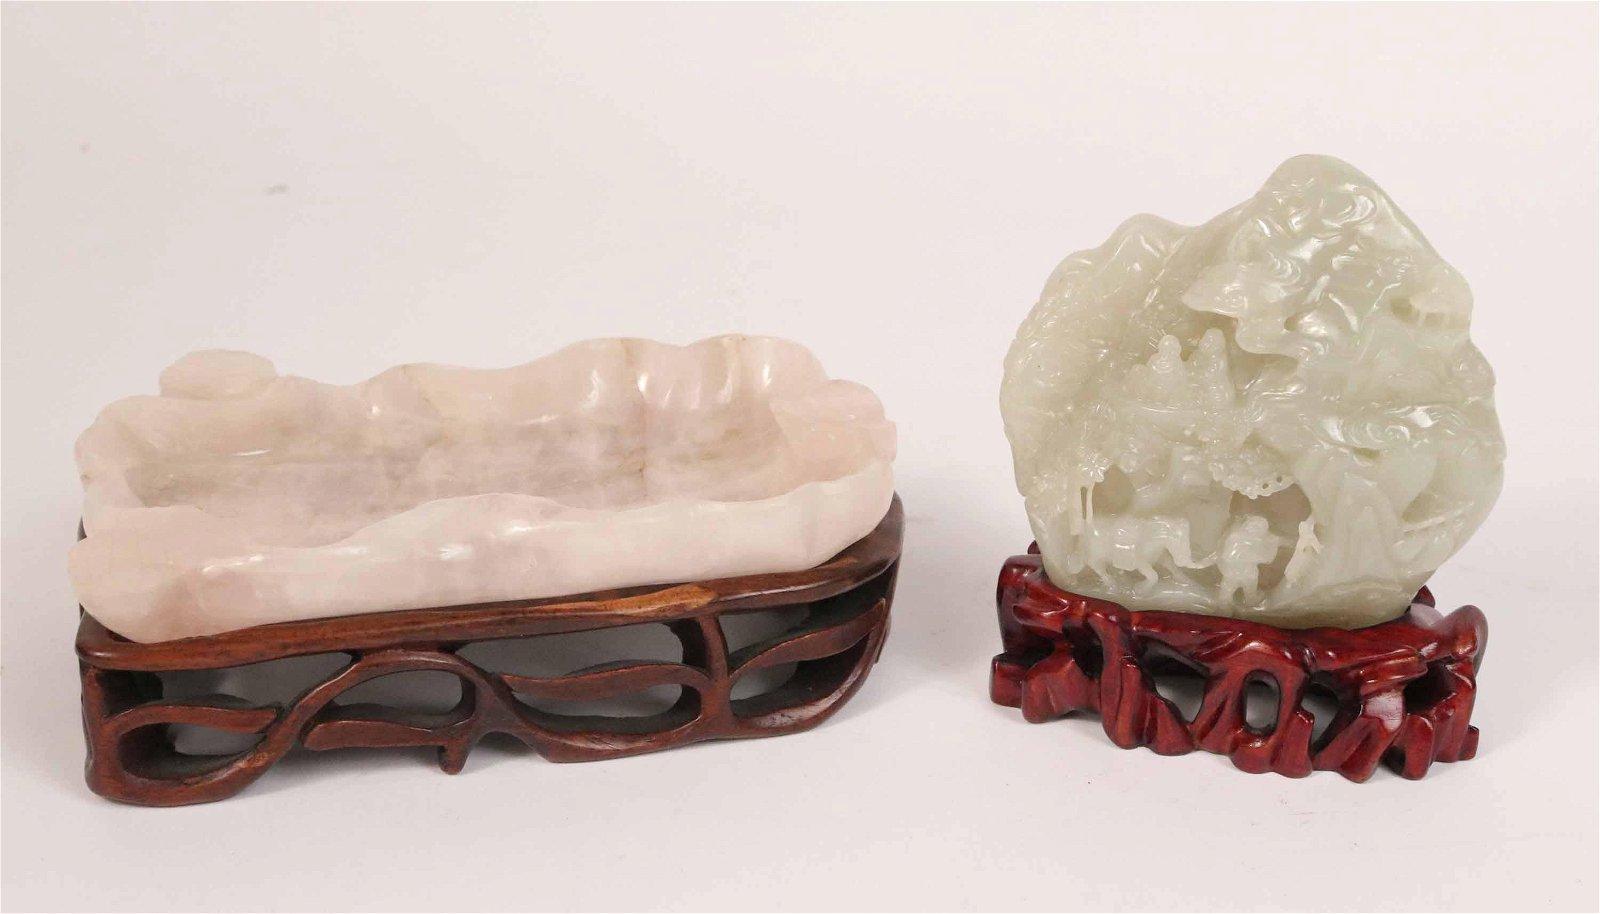 Chinese Carved Rose Quartz Brush Washer